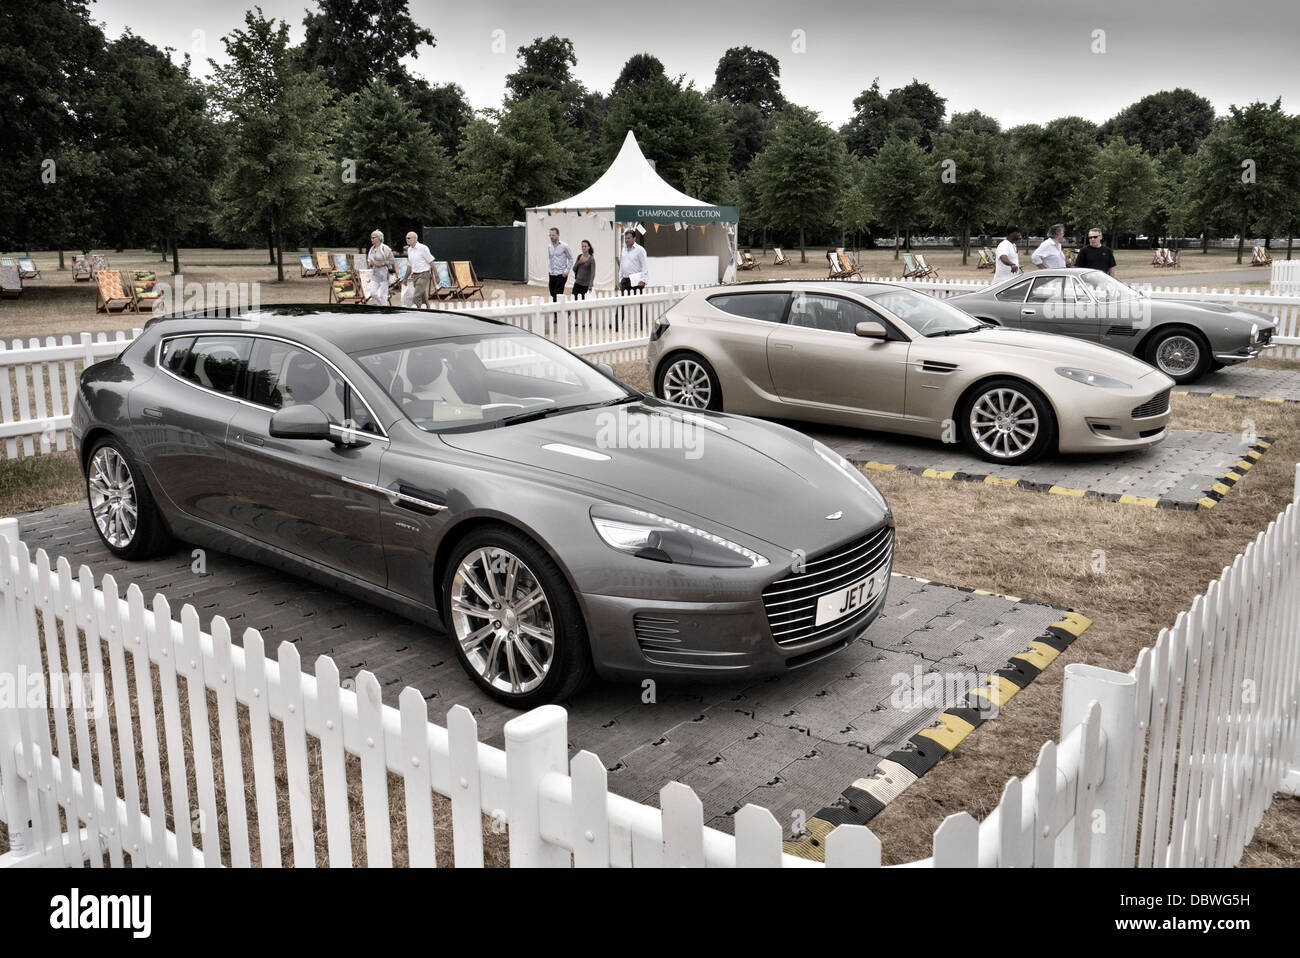 aston martin bertone jet concept cars on display at the aston